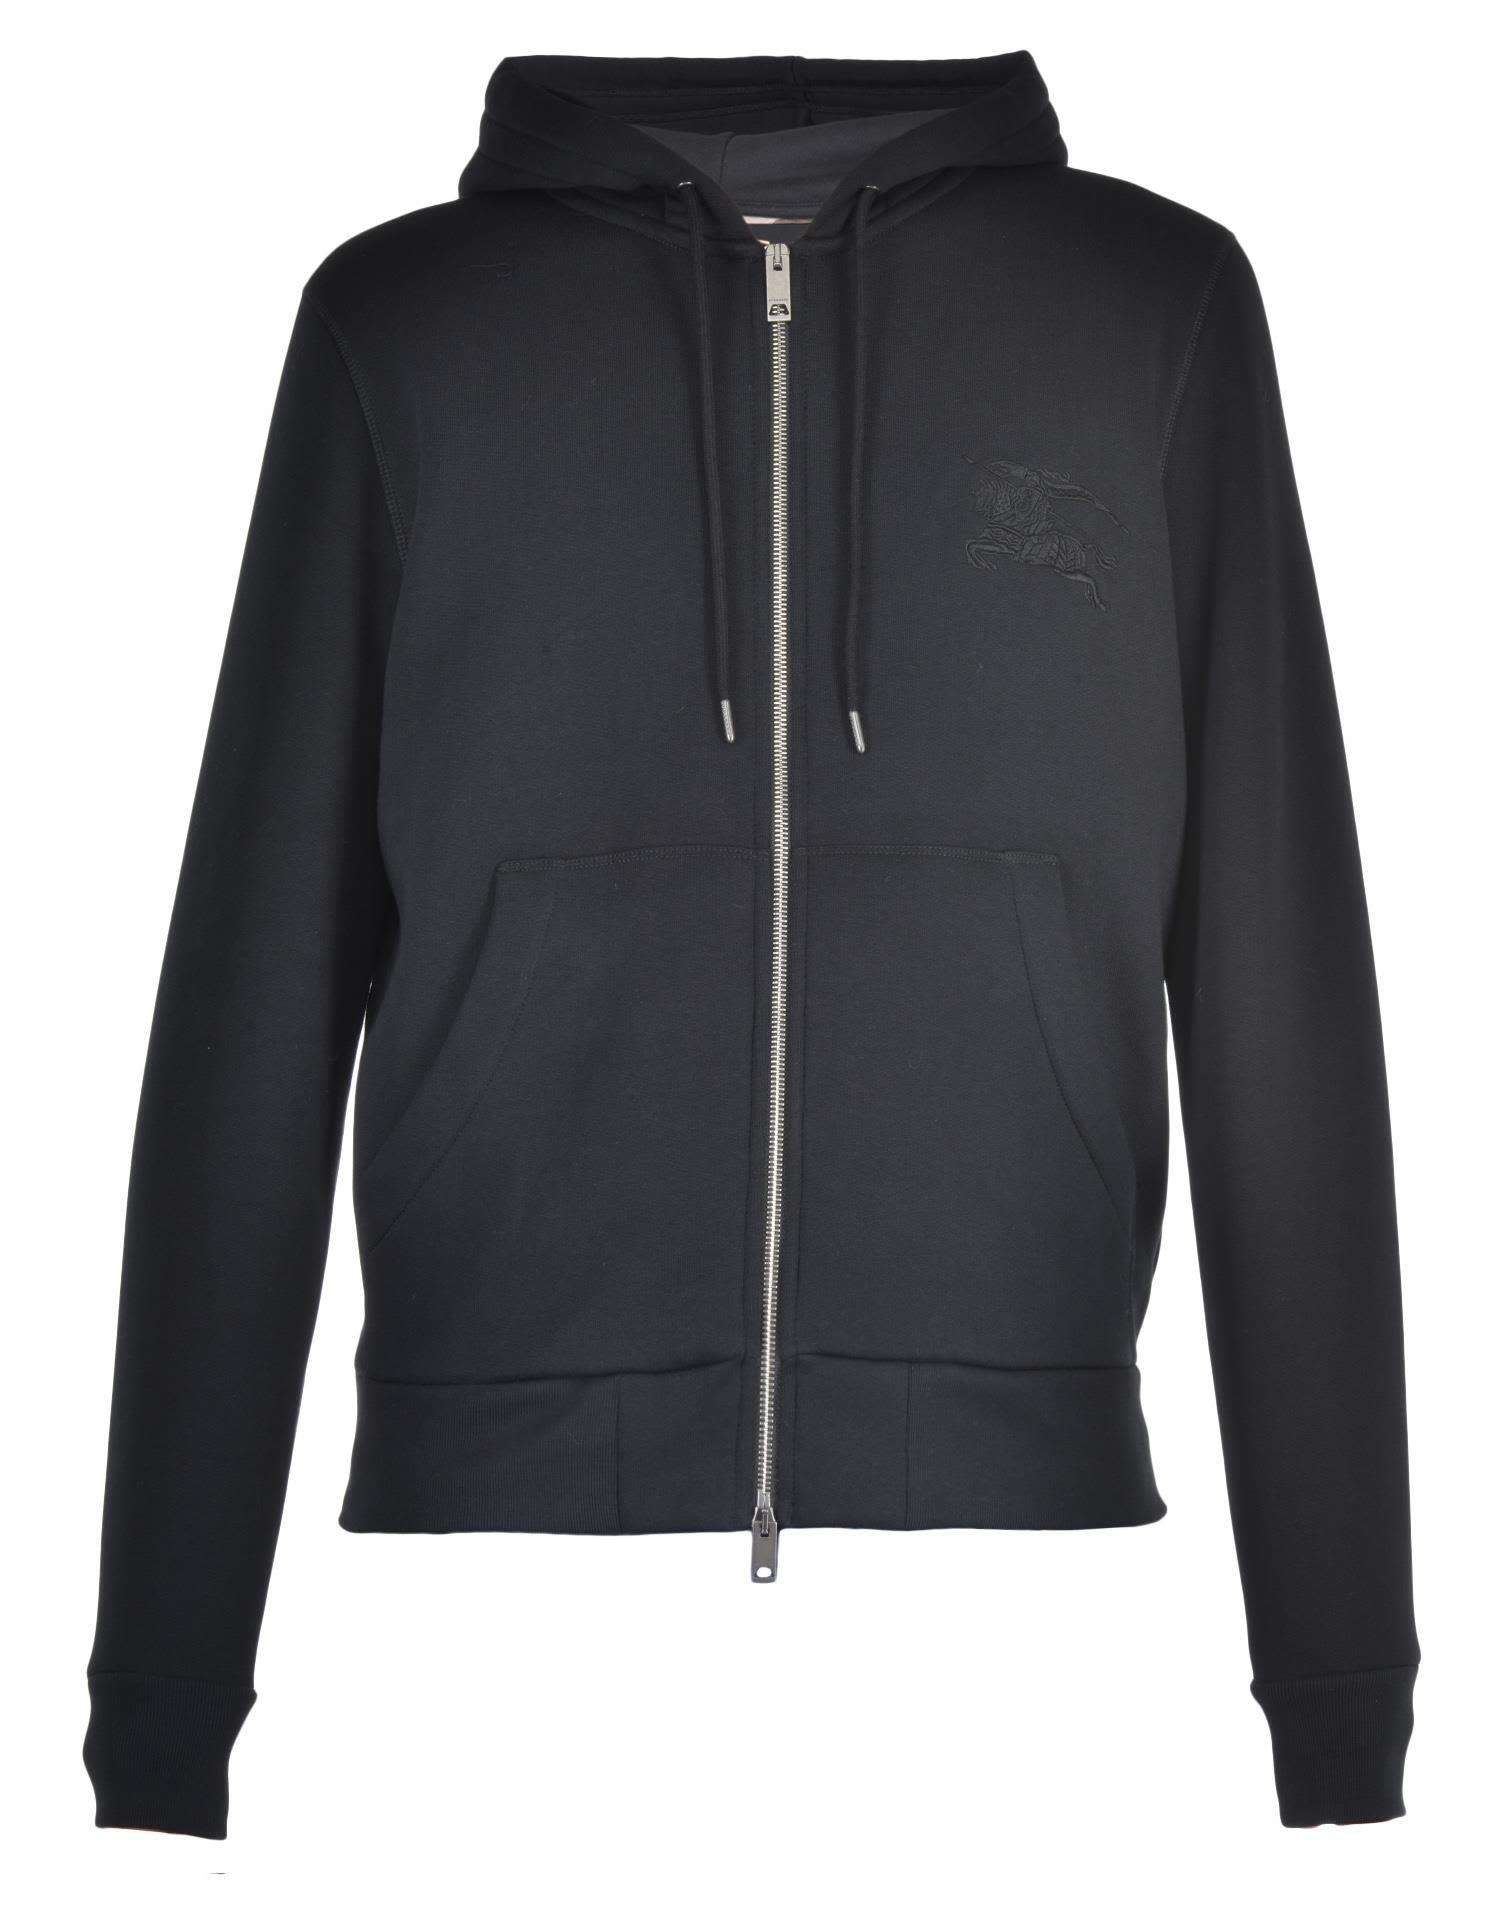 Burberry Fentford Sweatshirt